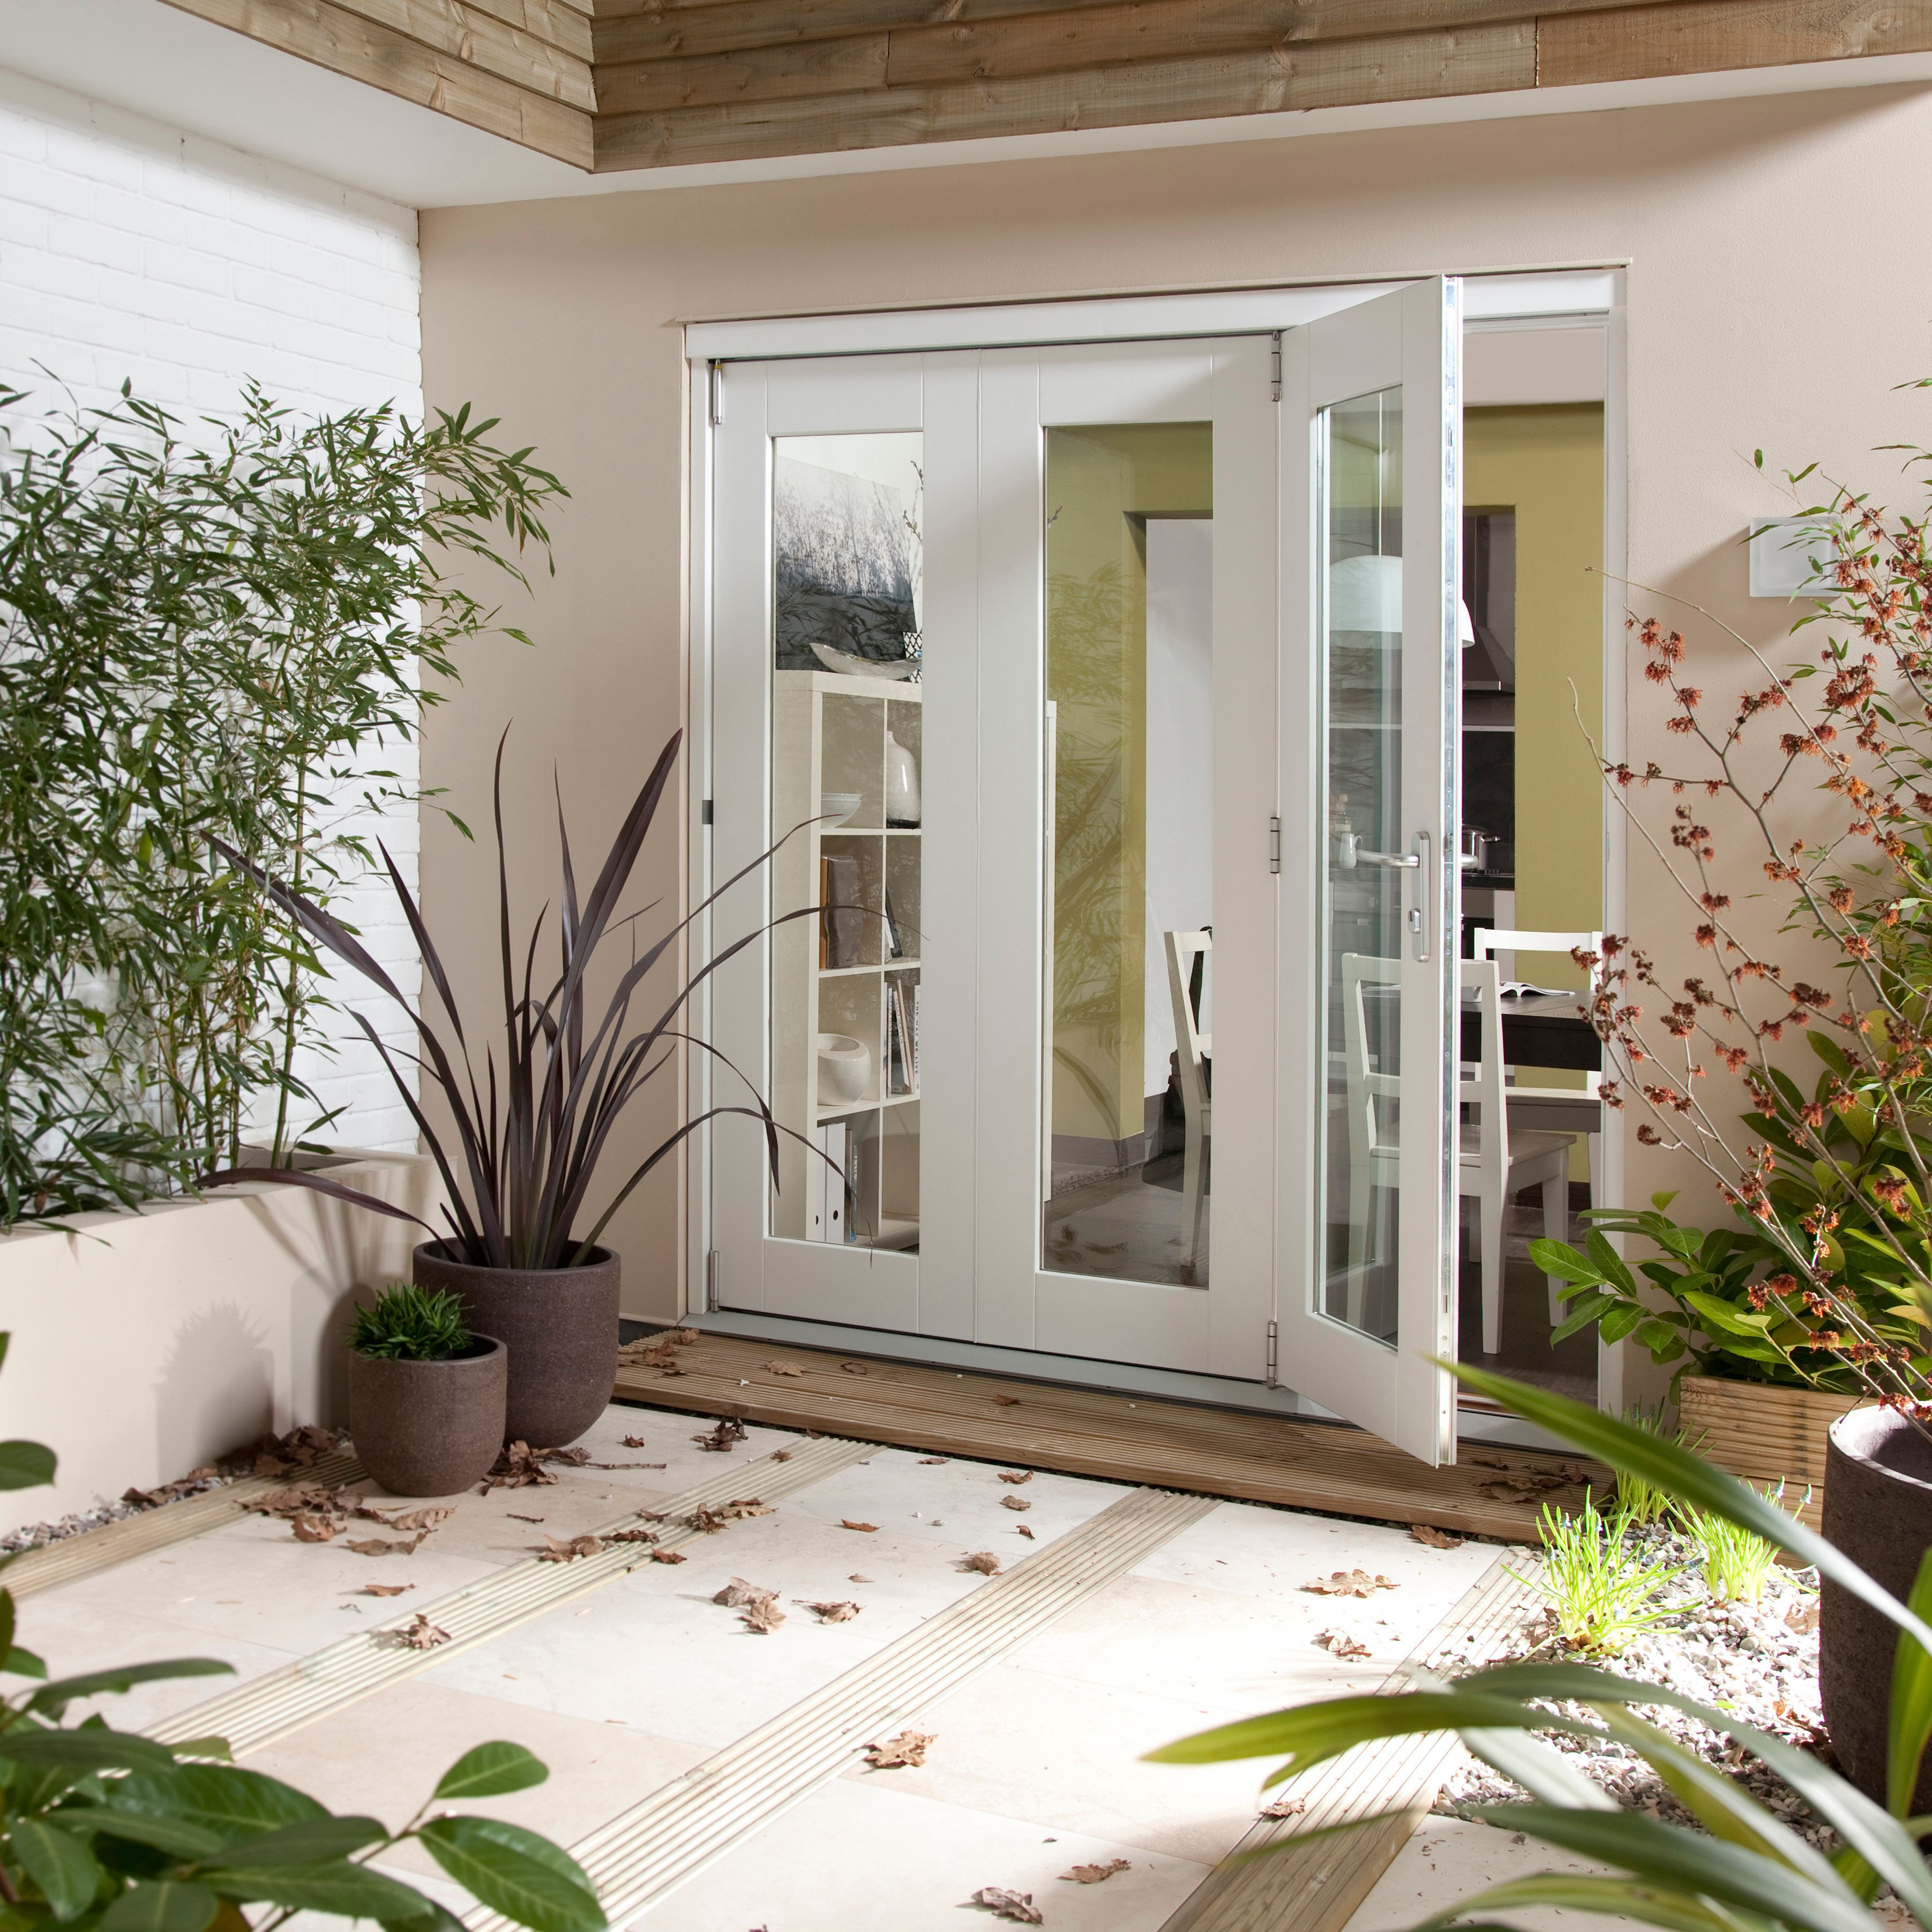 Pre-finished White Glazed Folding Sliding Patio Doors, (h)2105mm (w)1805mm